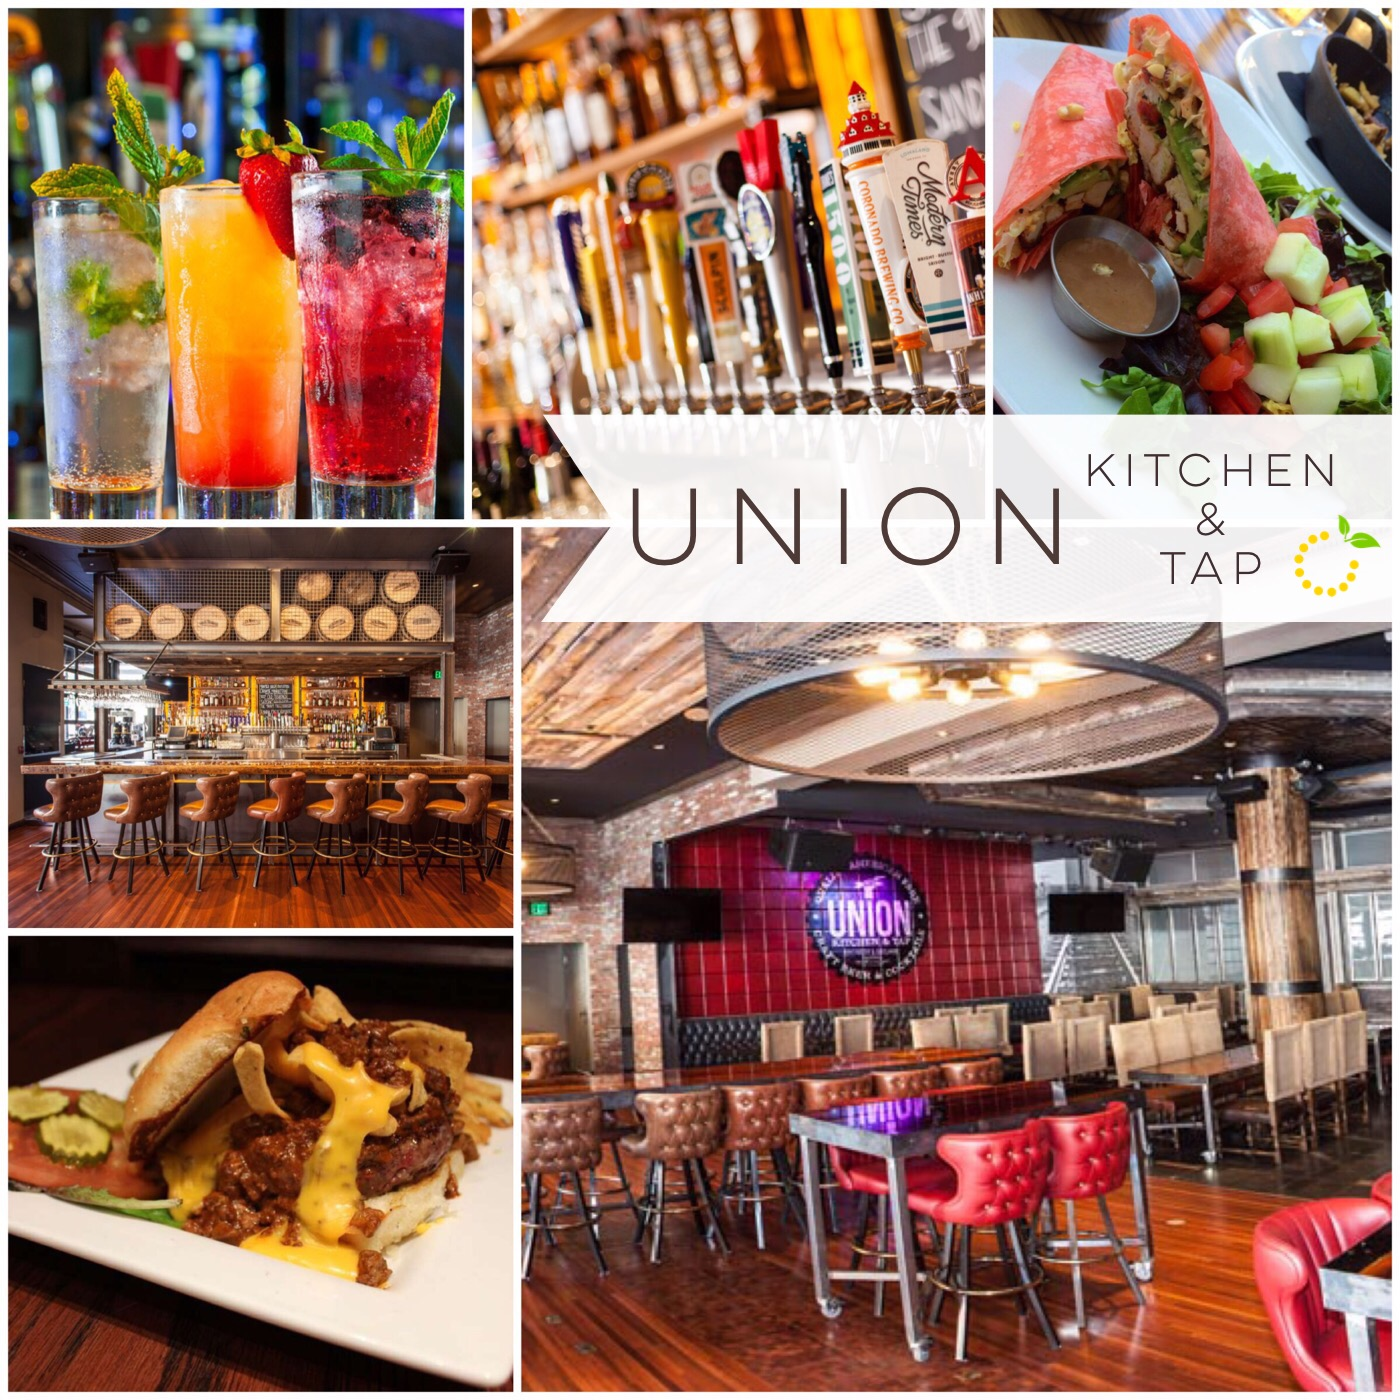 UNION Kitchen sweetlemonmade.com